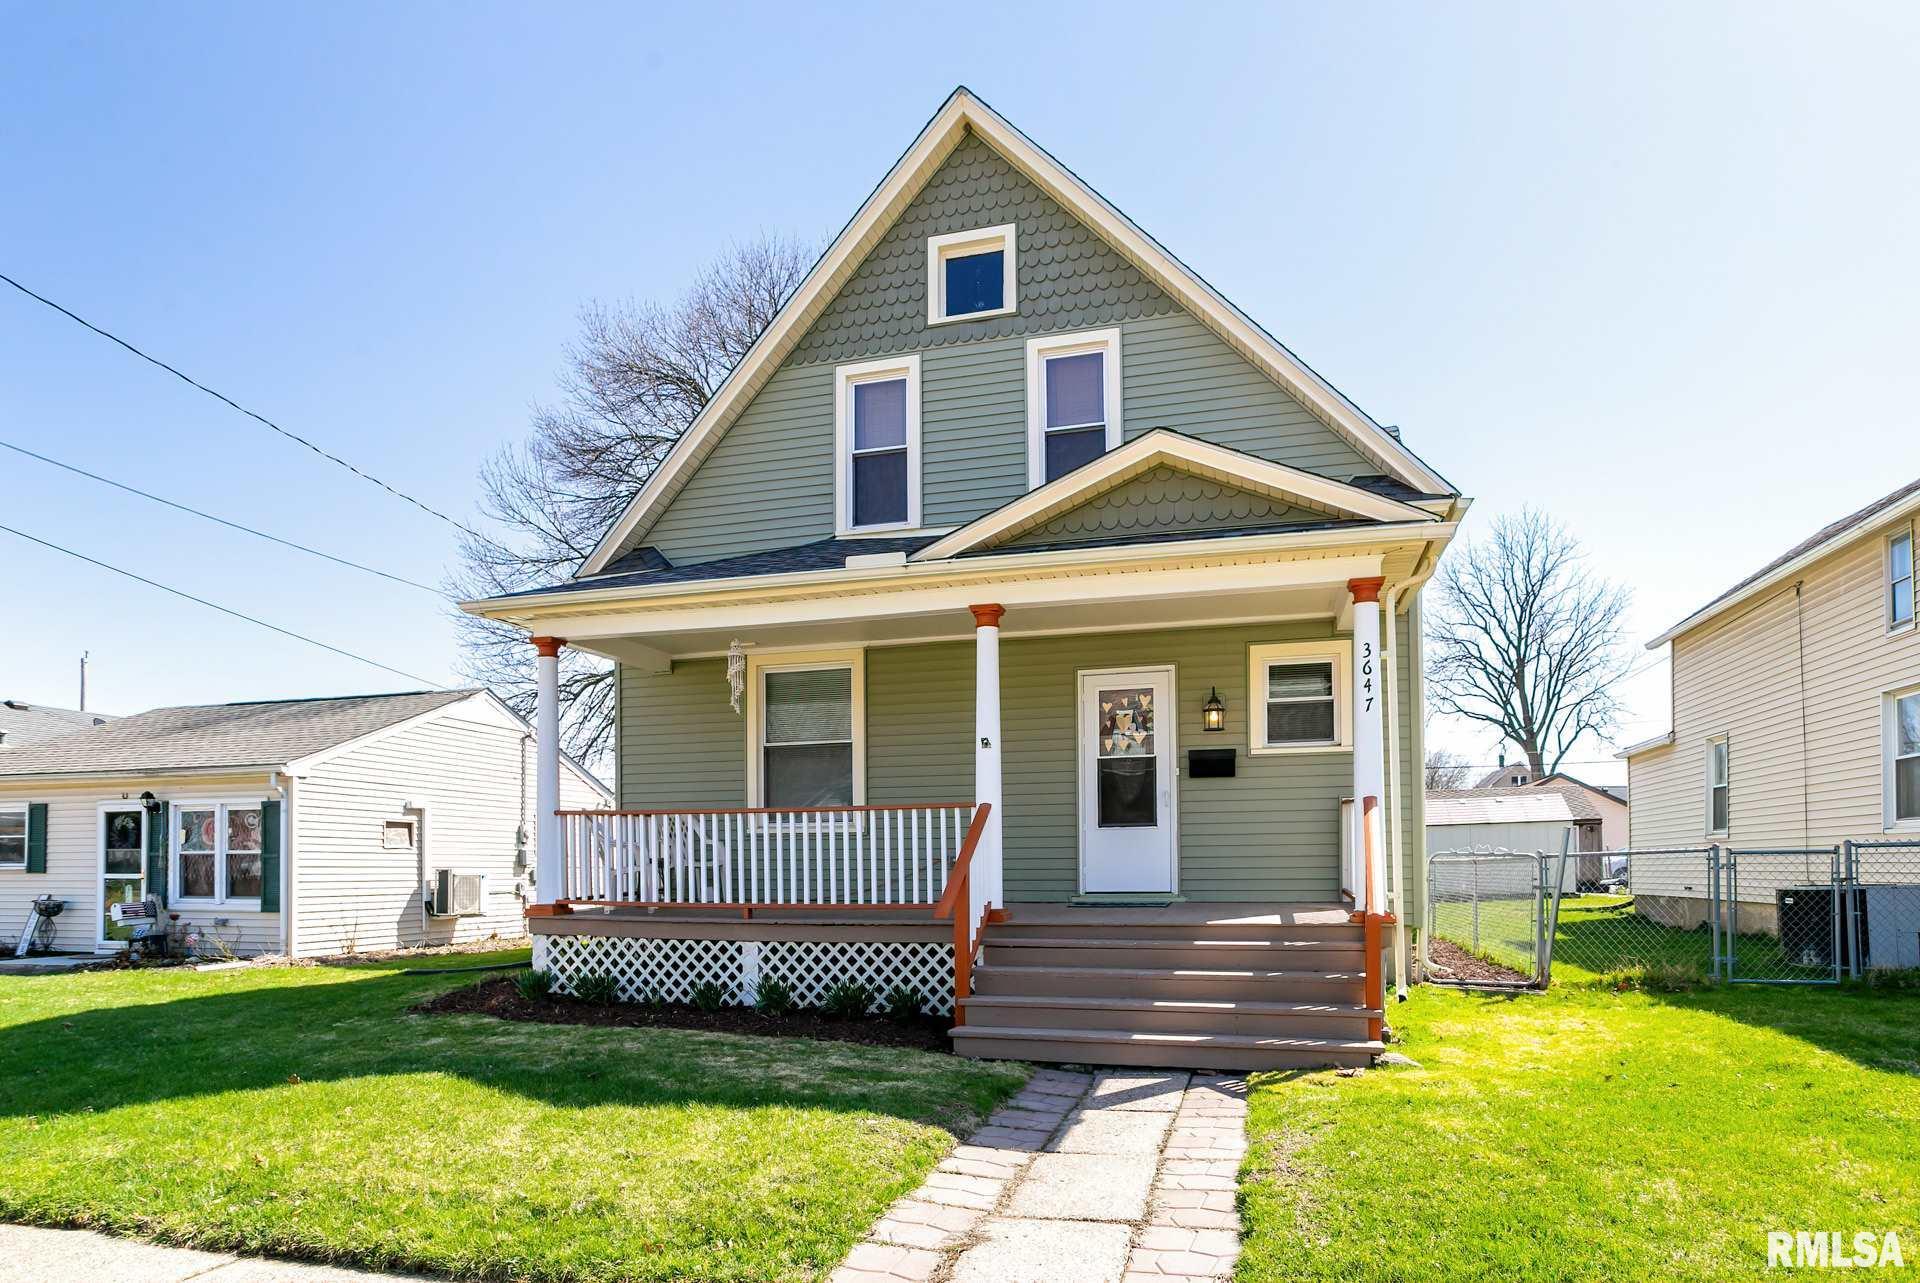 3647 BOIES Property Photo - Davenport, IA real estate listing